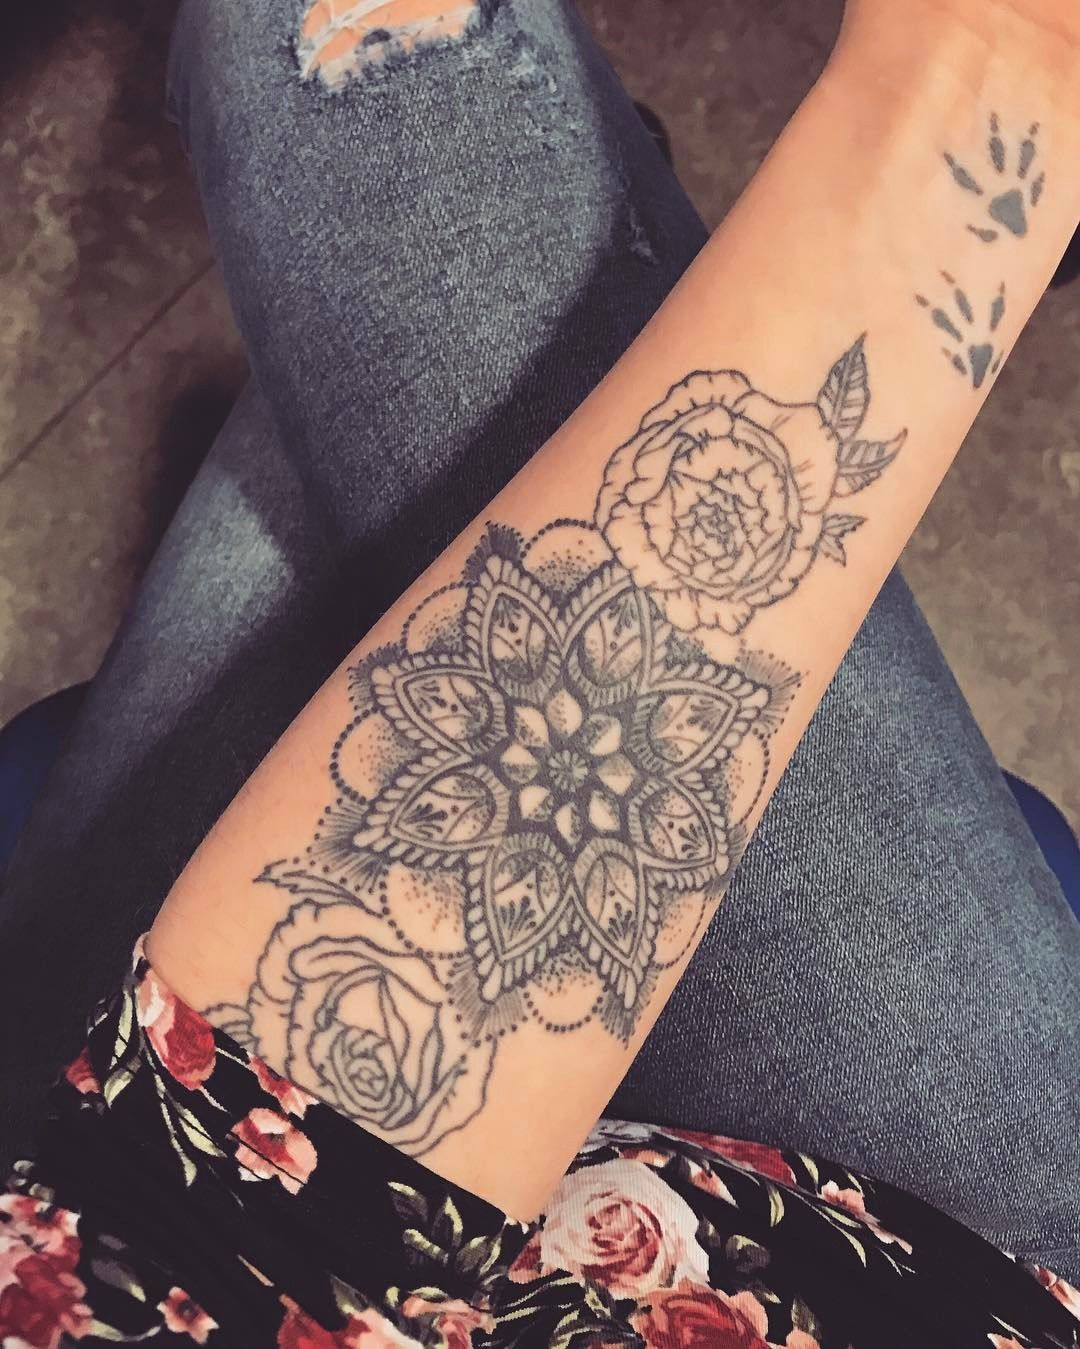 Arm tattoos for women_ cool arm tattoos arm tattoo arm